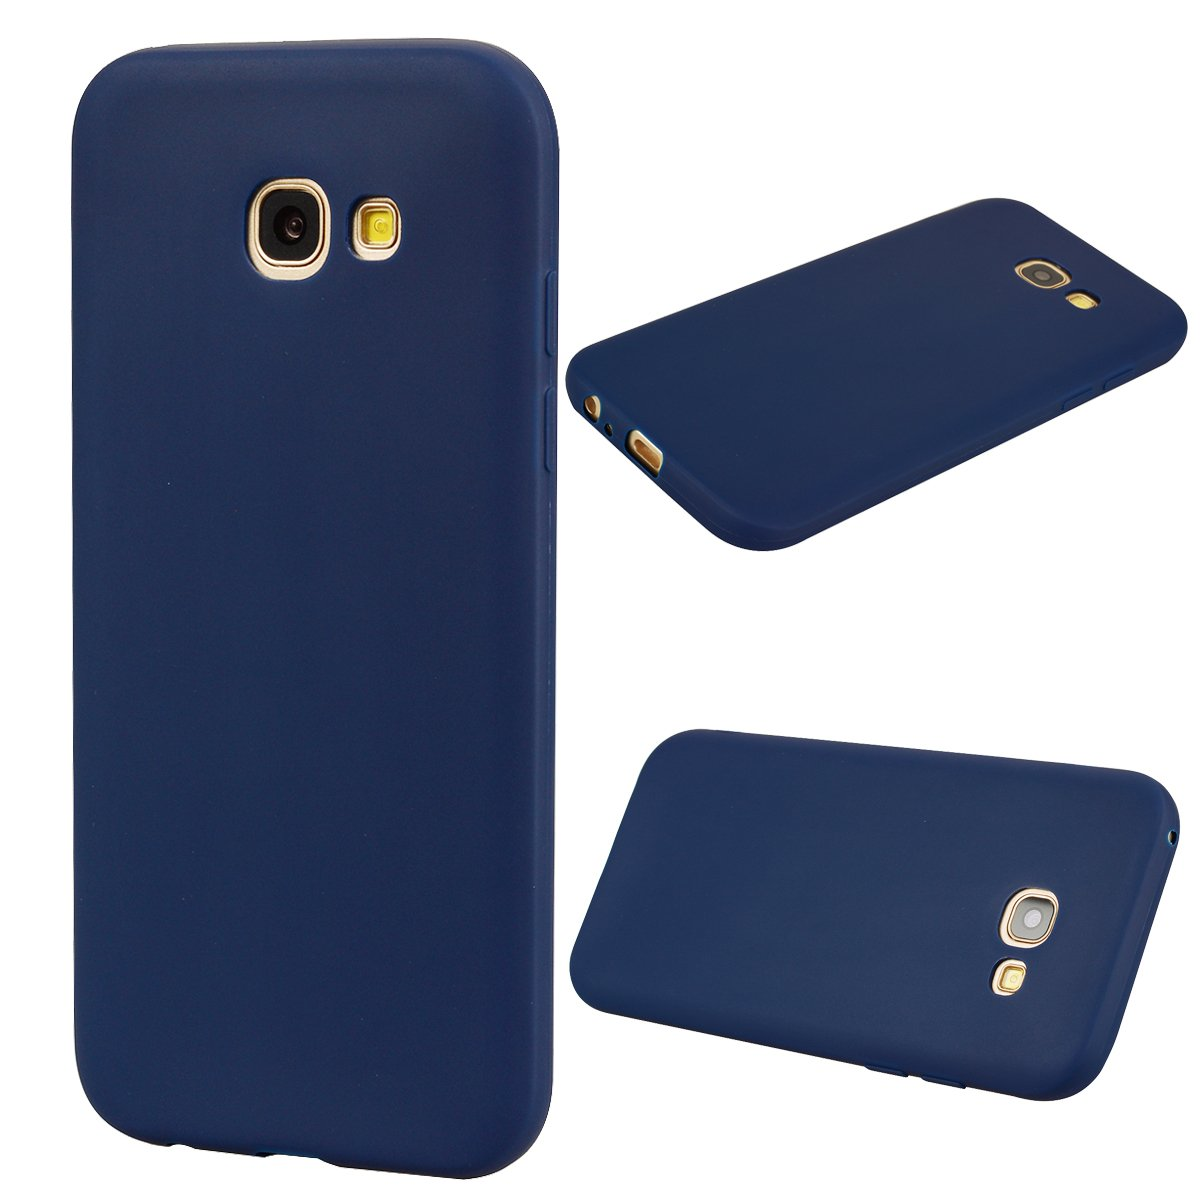 Blau Everainy Kompatibel f/ür Samsung Galaxy A5 2017 Silikon H/ülle Ultrad/ünn H/üllen Handyh/ülle Einfarbig Gummi f/ür Galaxy A5 2017 Schutzh/ülle Sto/ßfest TPU Gel Sto/ßstange Cover